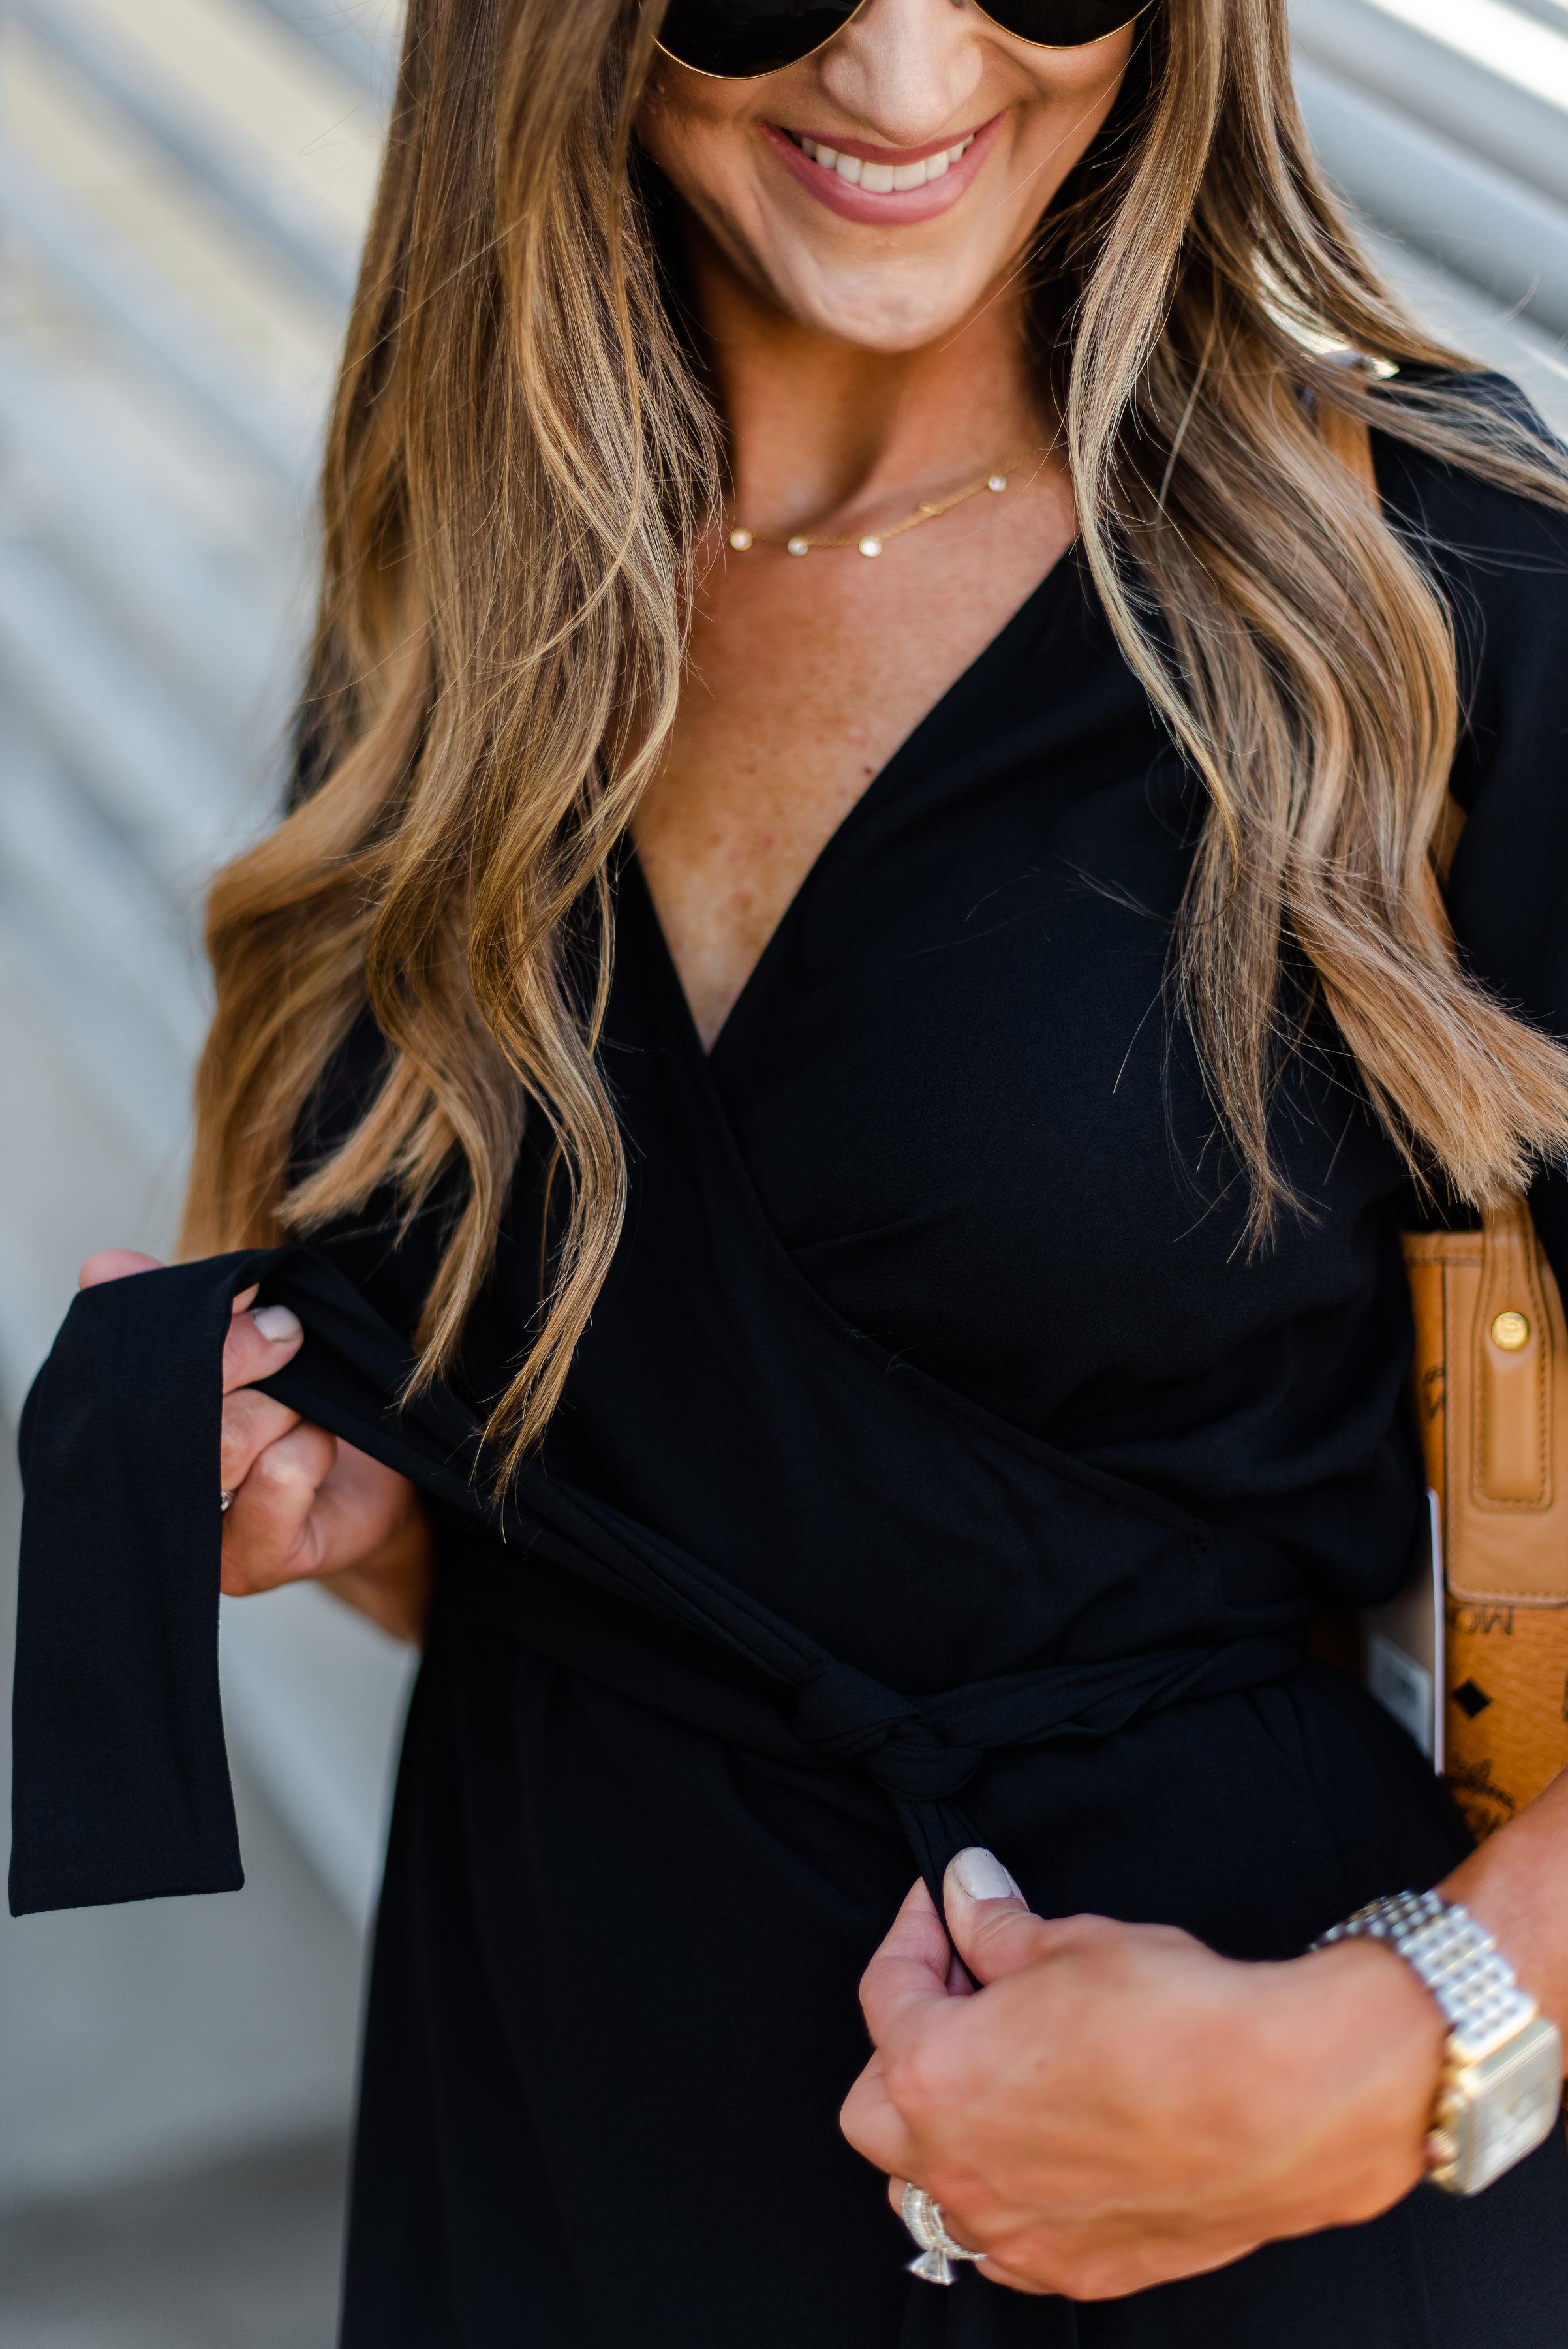 Wrap dress for work | lblack wrap dress | Nordstrom | Style Your Senses